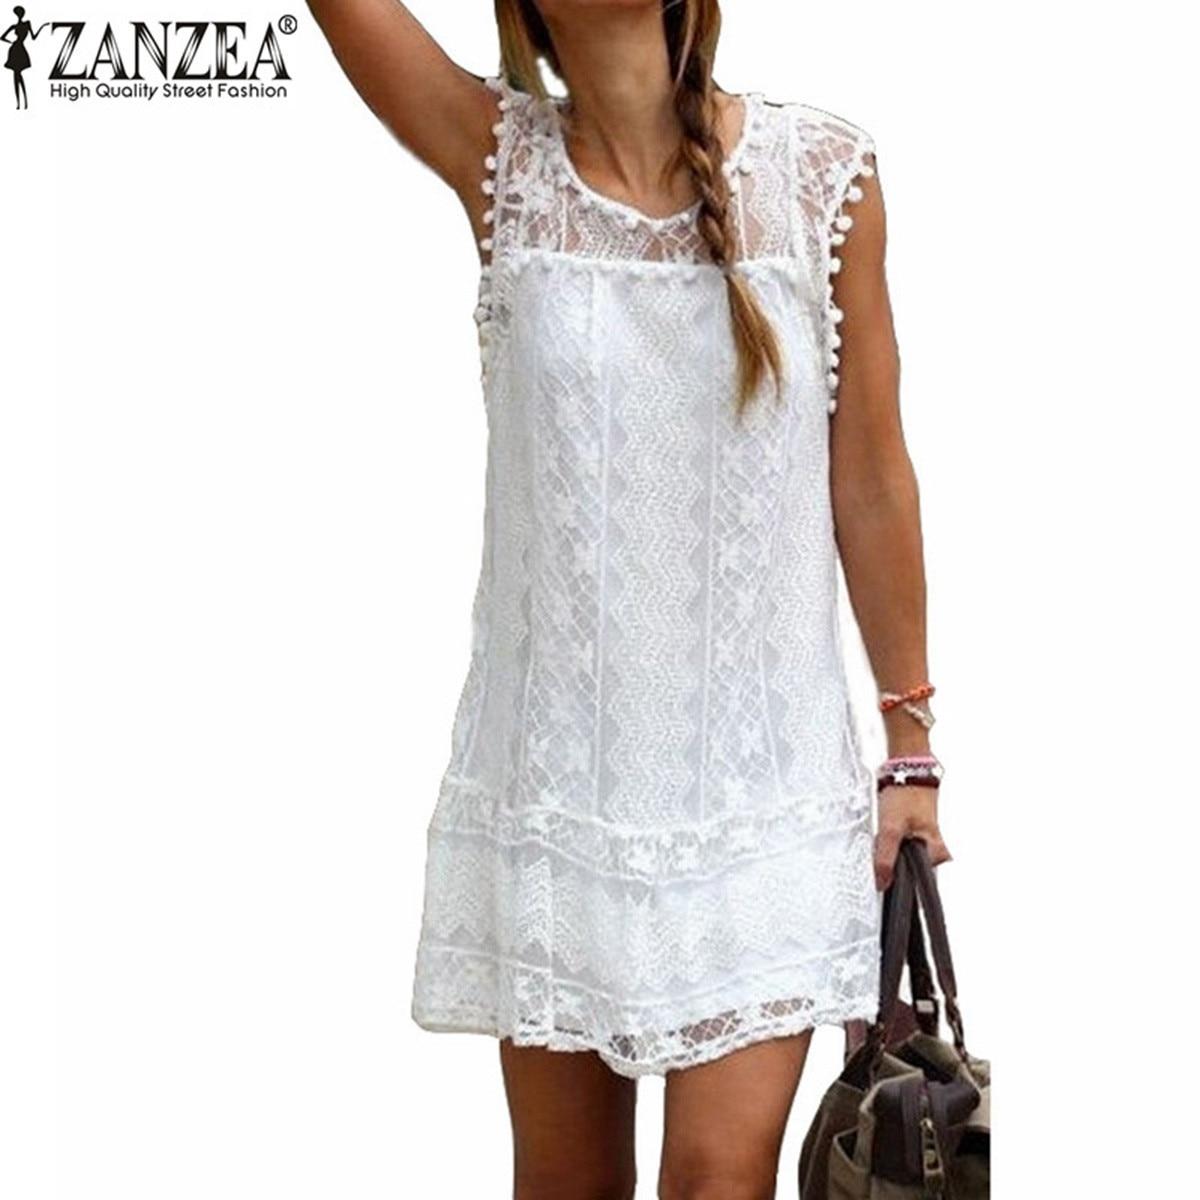 ZANZEA Vestidos 2017 Summer Elegant Women Casual Solid Short Sleeve Slim Lace Mini Dress Tops Ladies Sexy White Dress Plus Size